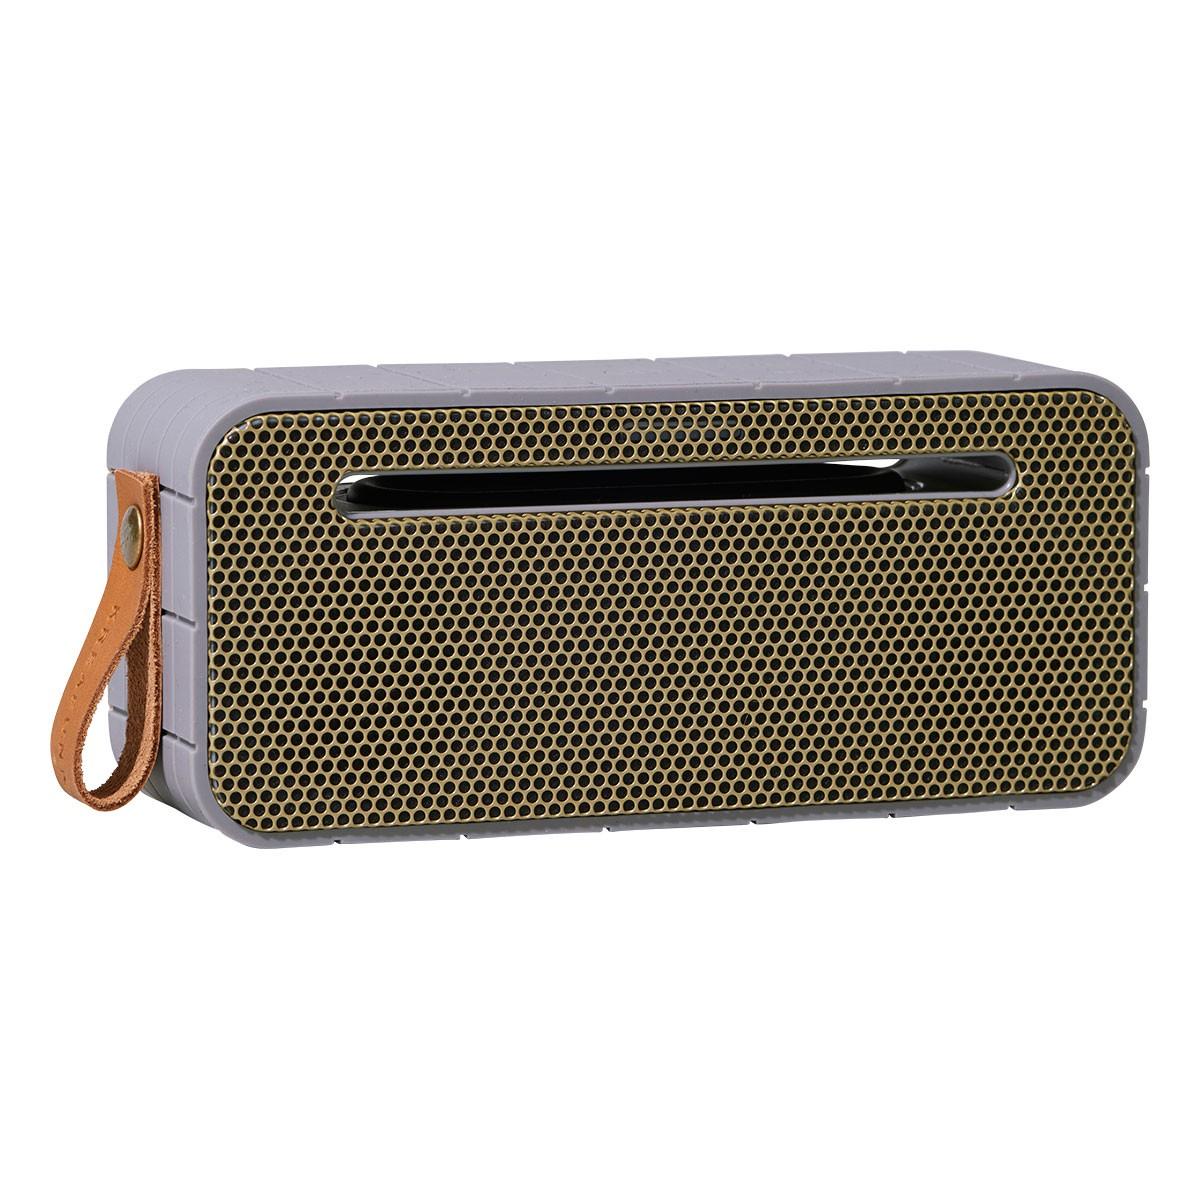 Kreafunk - aMove Bluetooth Speaker - Cool Grey (Kfng69)